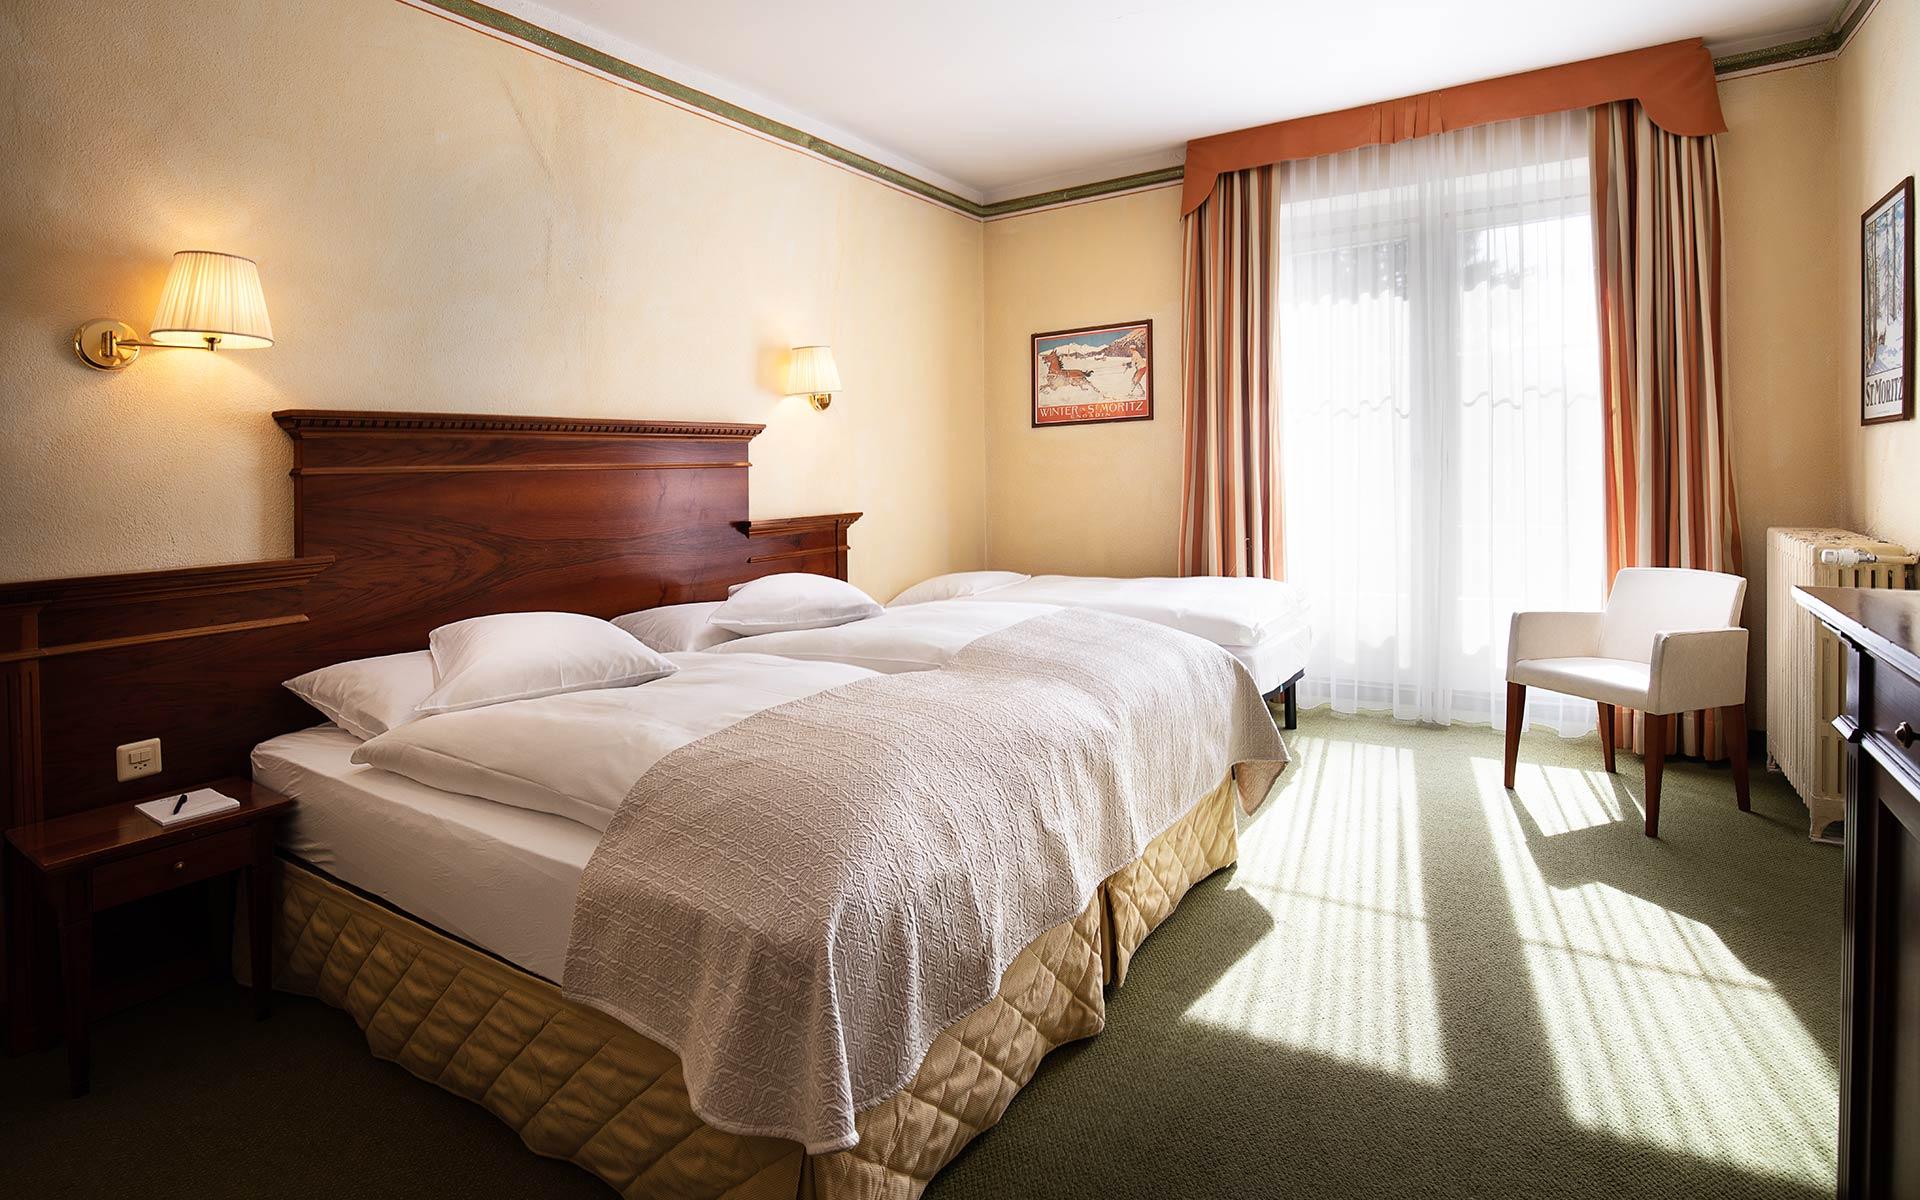 Hotel Reine Victoria Economy